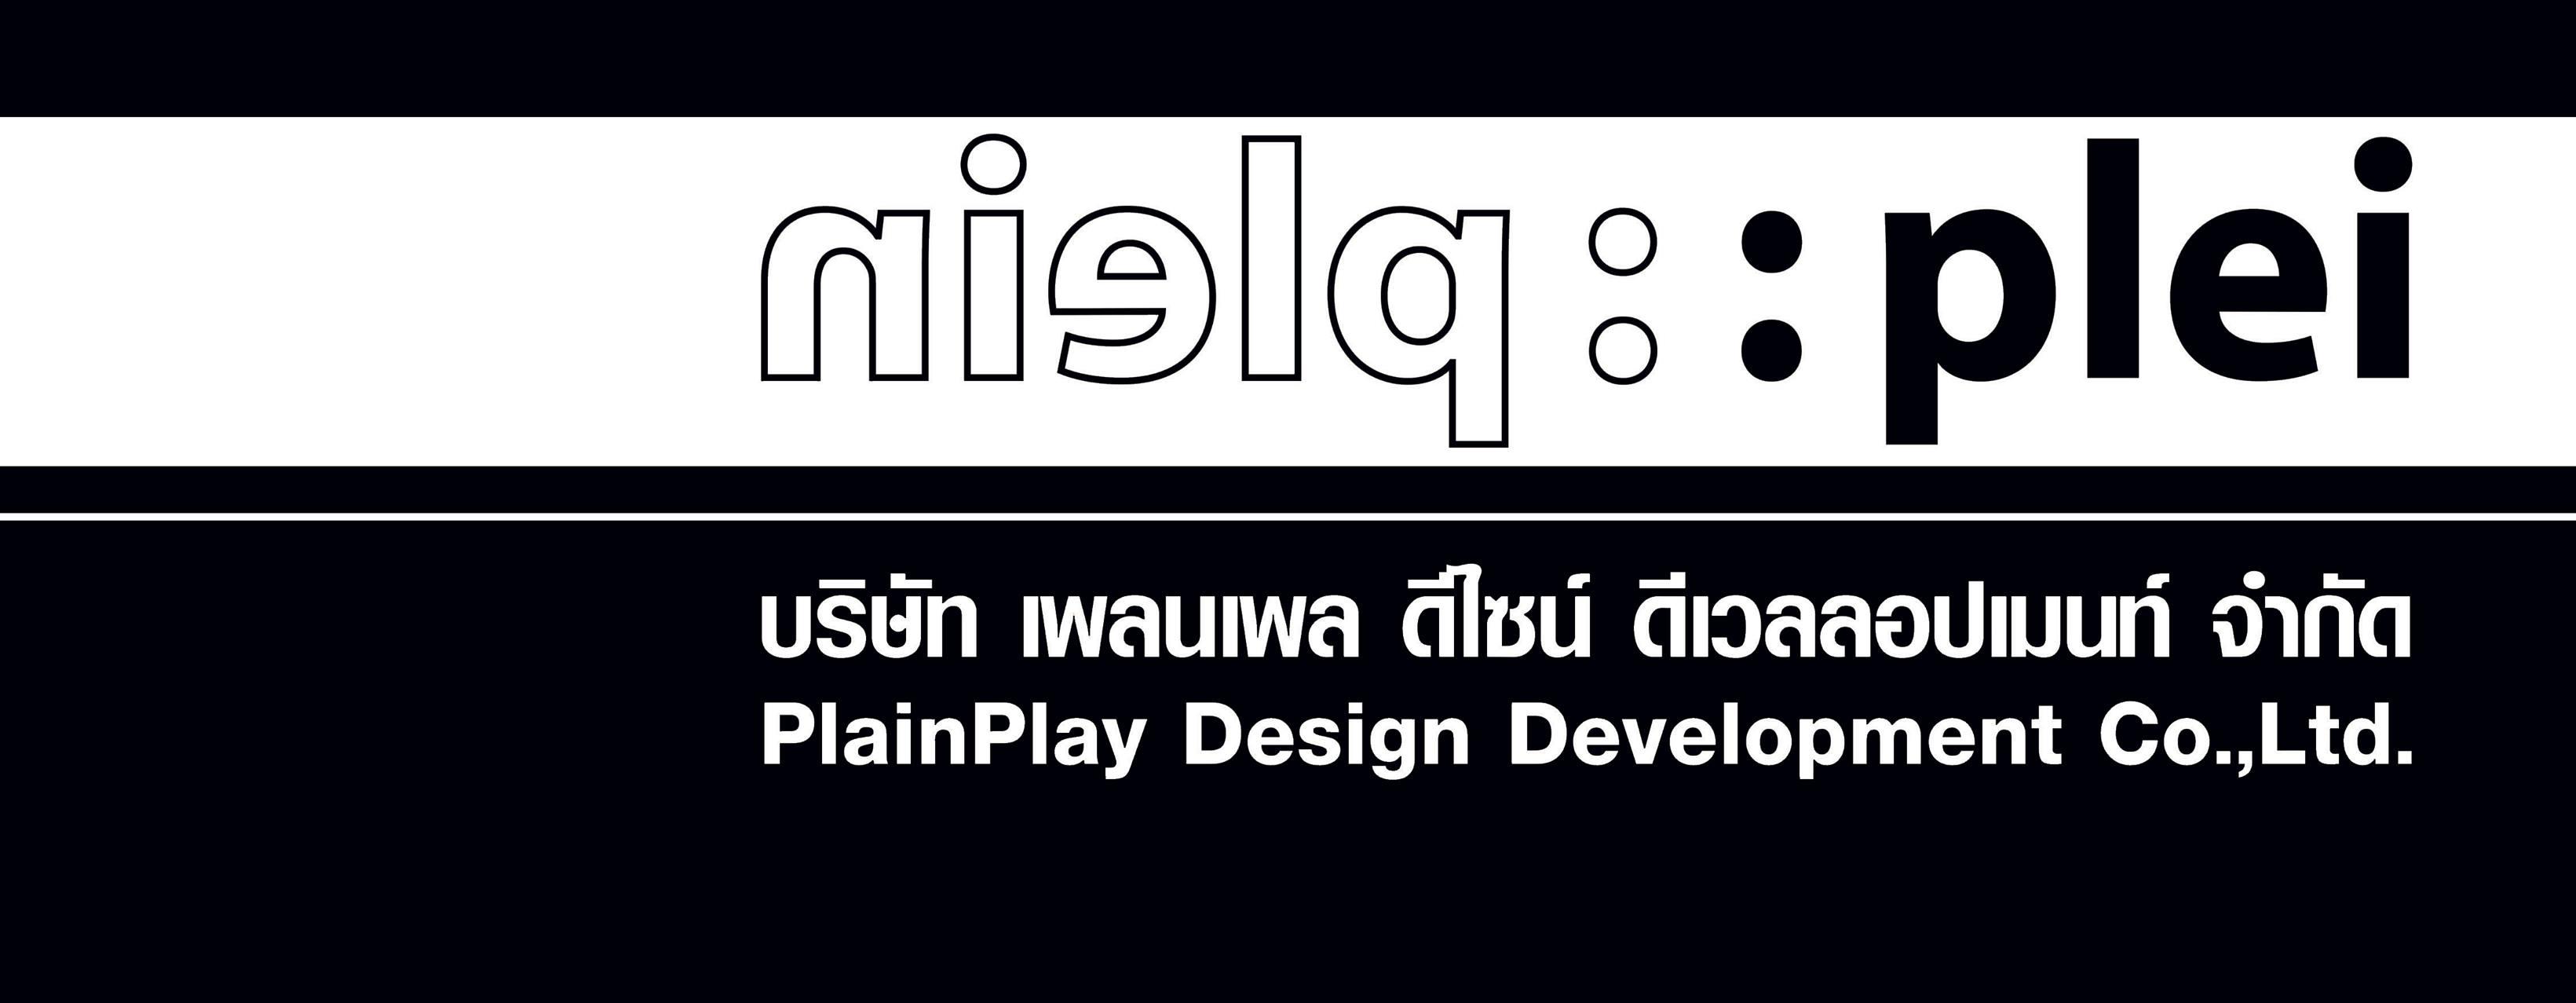 Plainplay Design Development